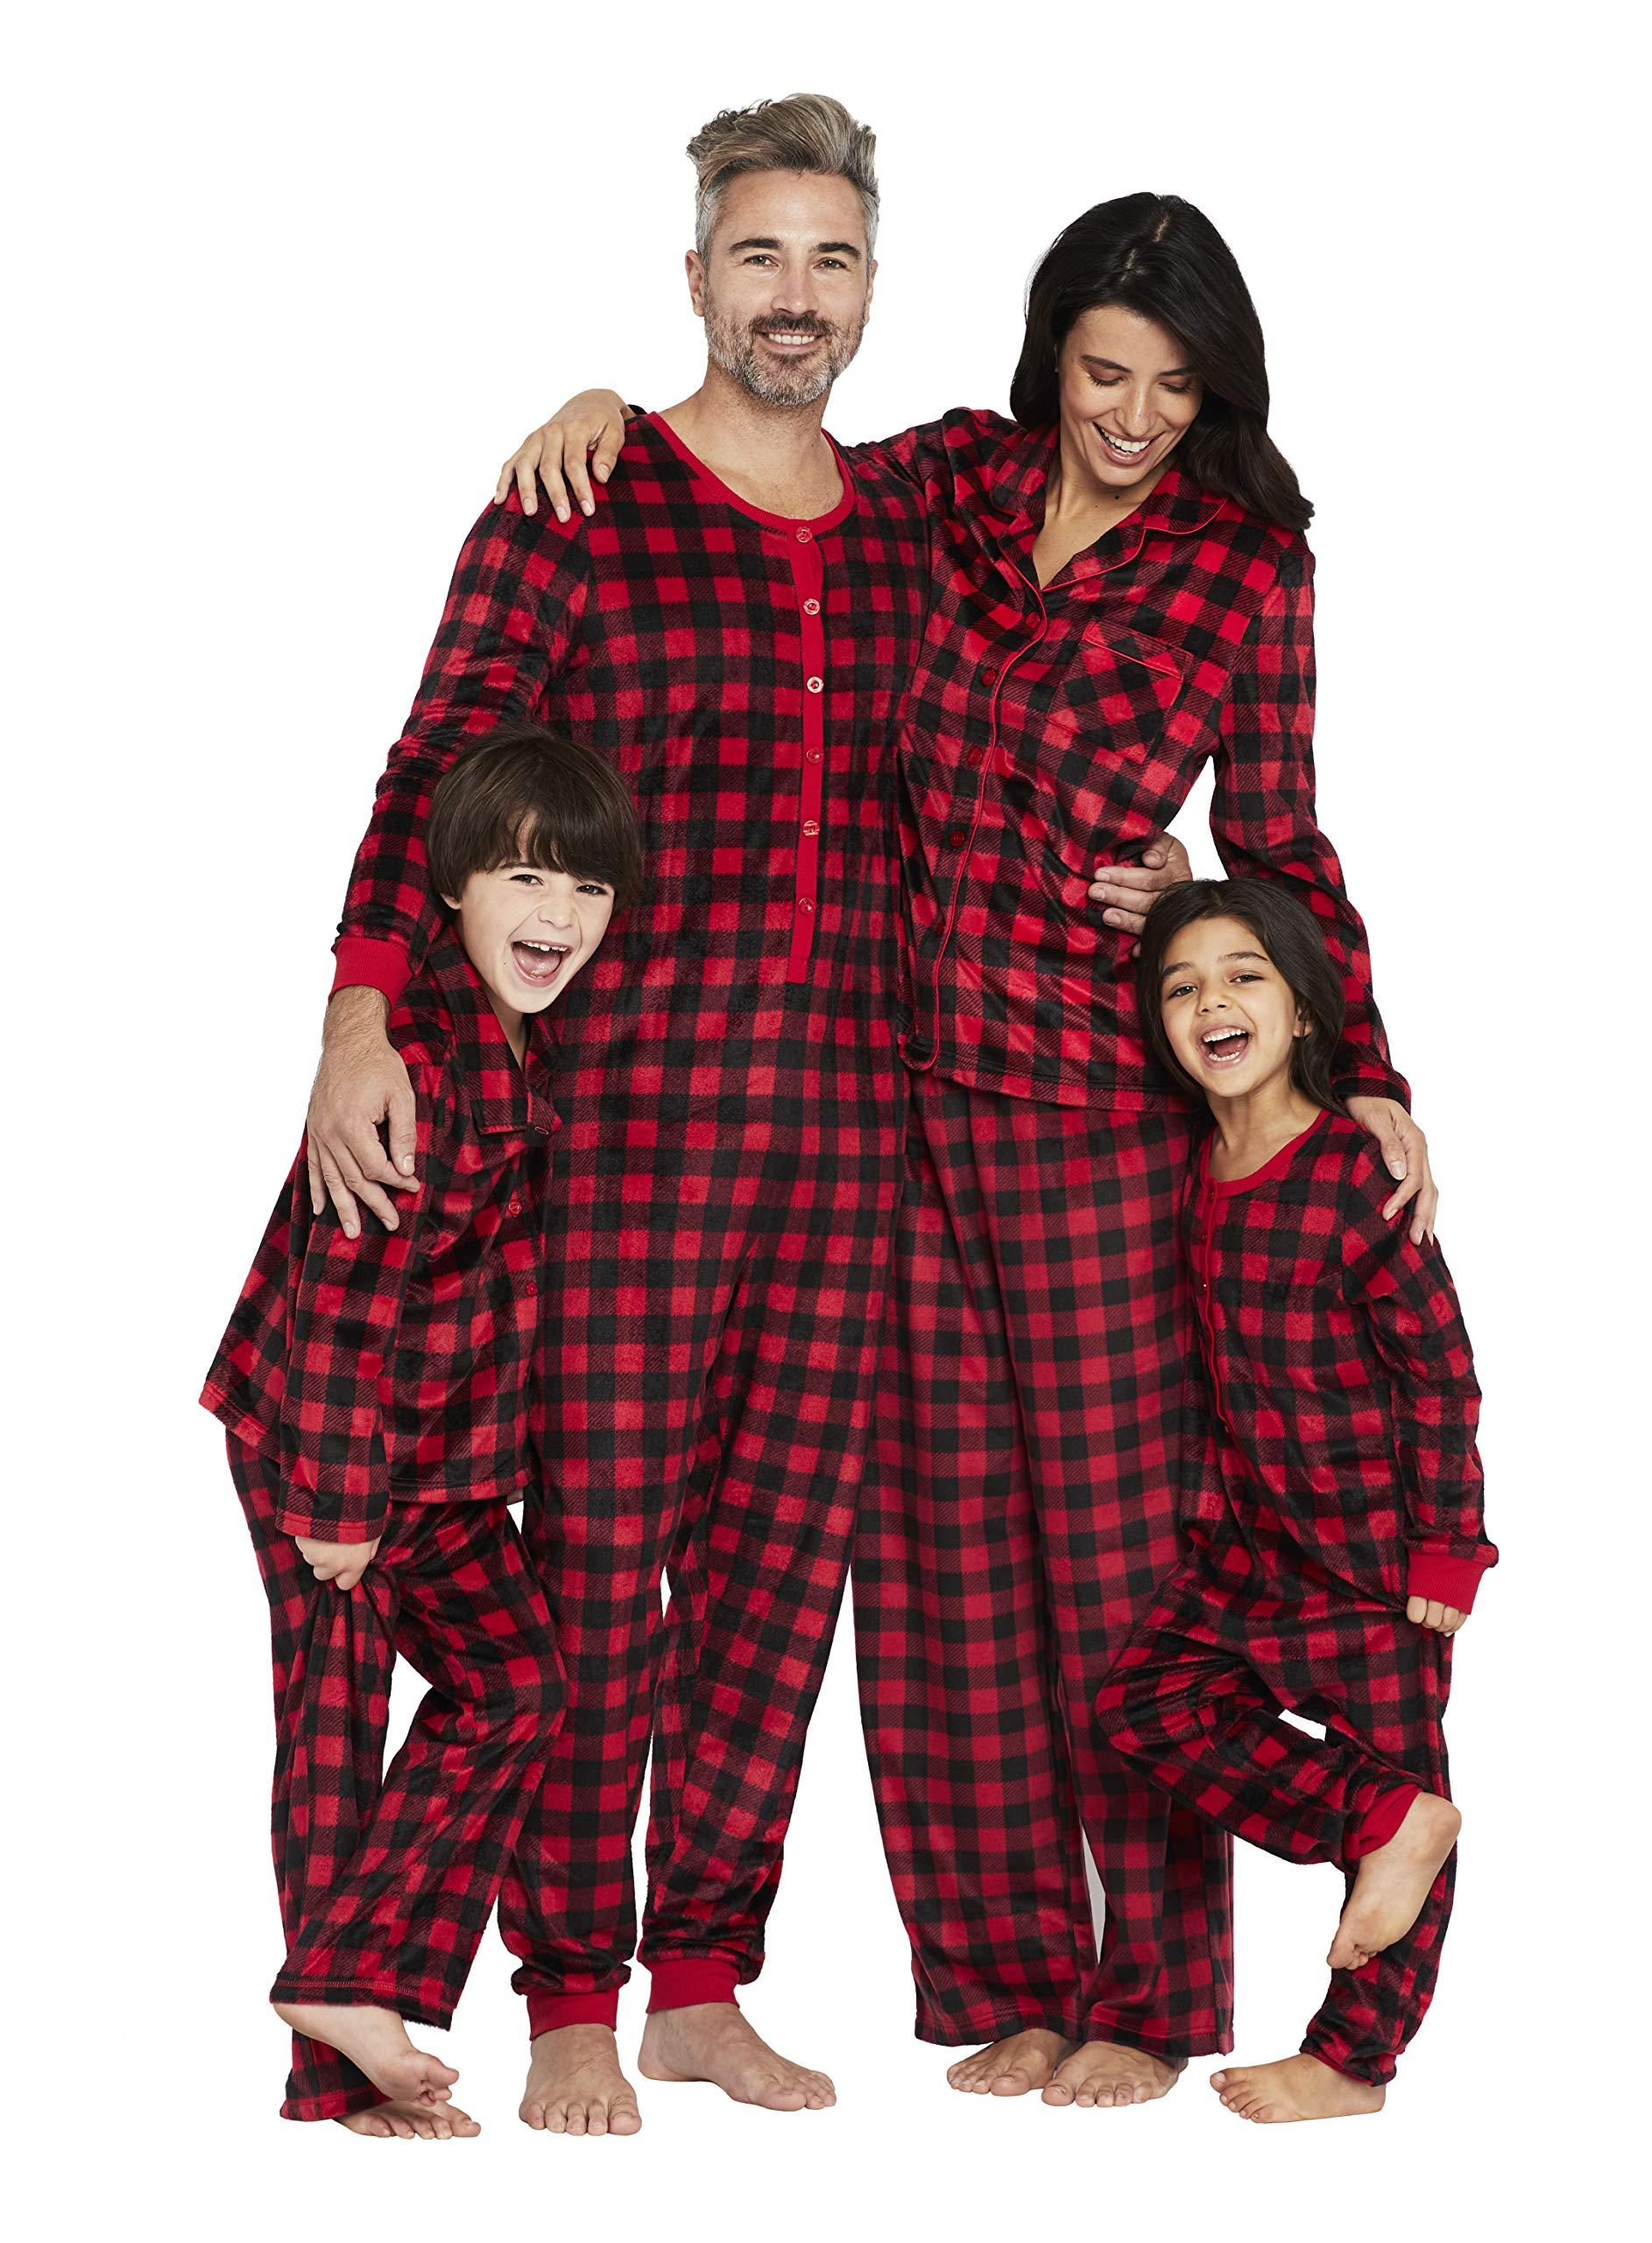 Karen Neuburger Girls' Little Family Matching Christmas Holiday Pajama Sets PJ, Buffalo Plaid red Cherry/Black Combo, Kid M by Karen Neuburger (Image #5)